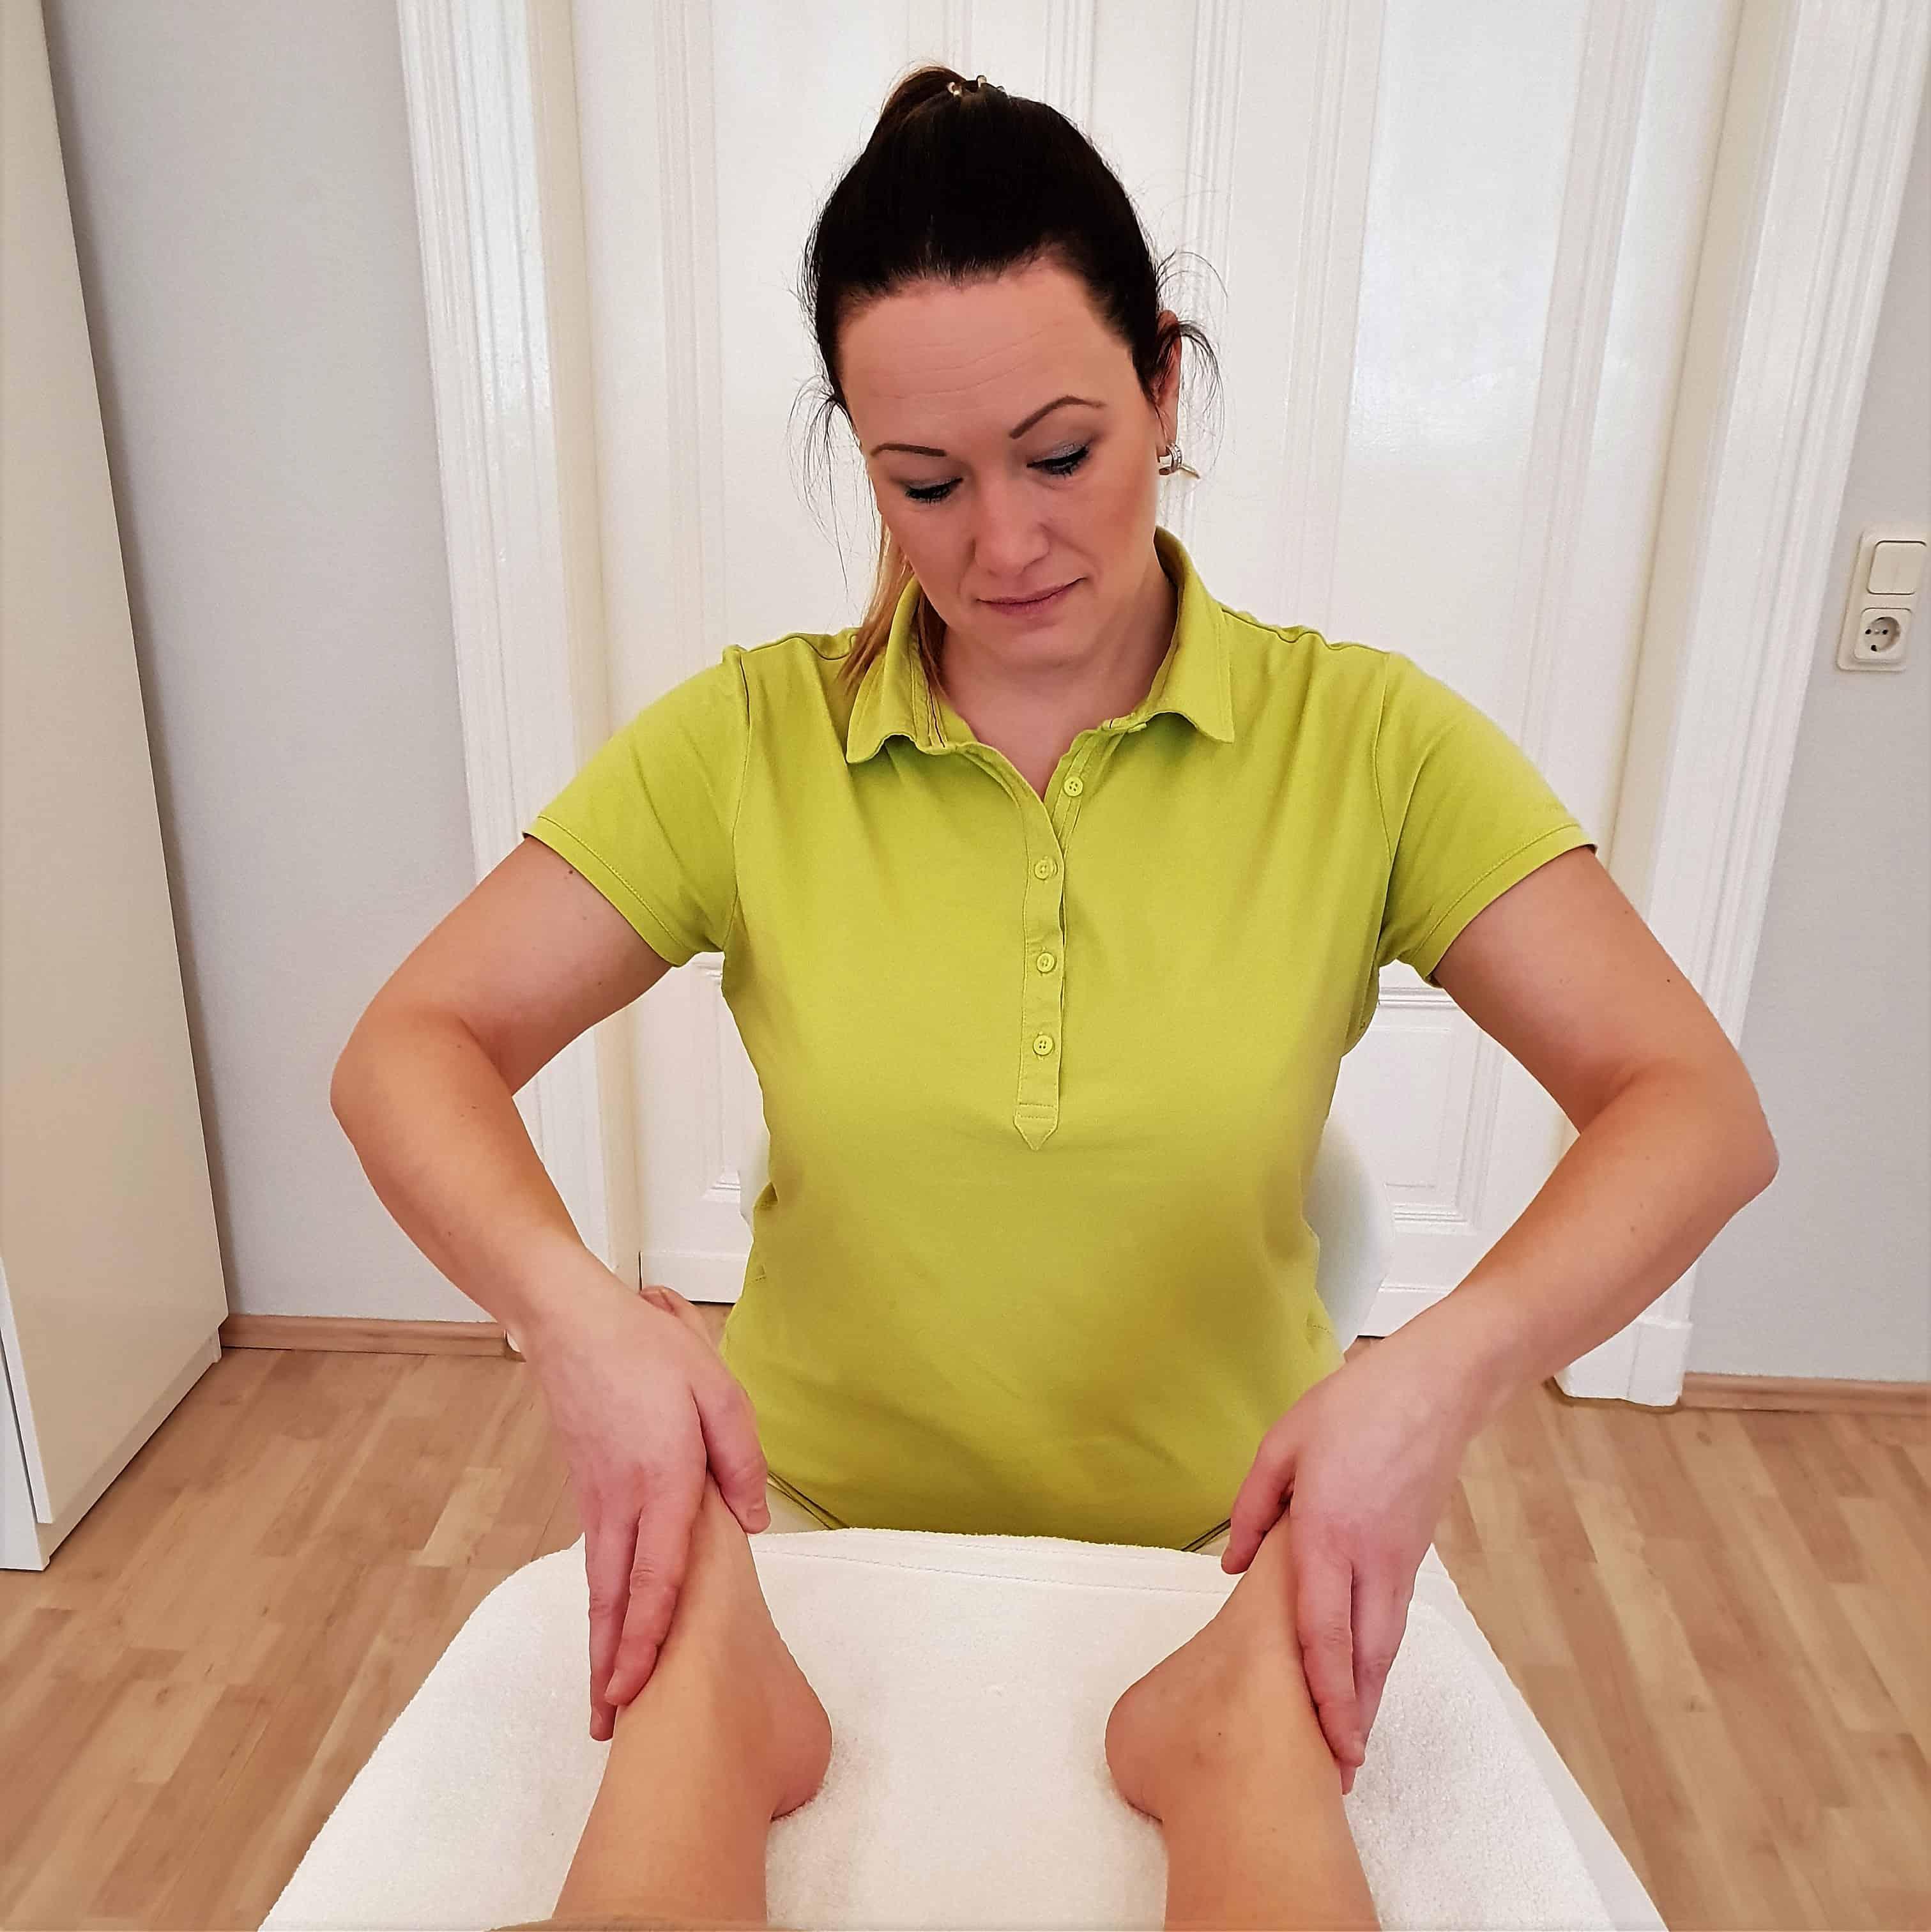 Daniela Kaiser Fußreflexzonen Therapie Behandlung